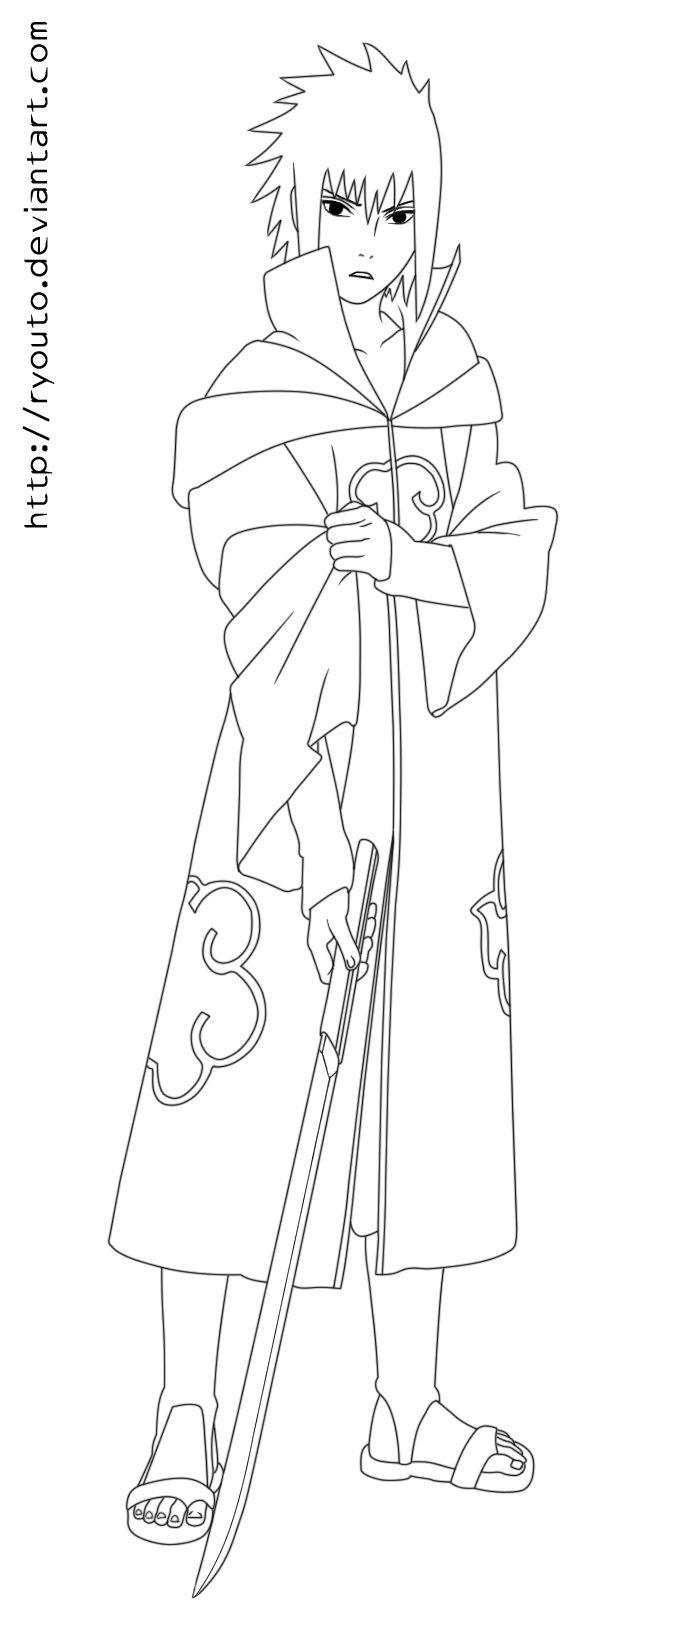 Akatsuki Sasuke Lineart 411 By Ryouto Deviantart Com On